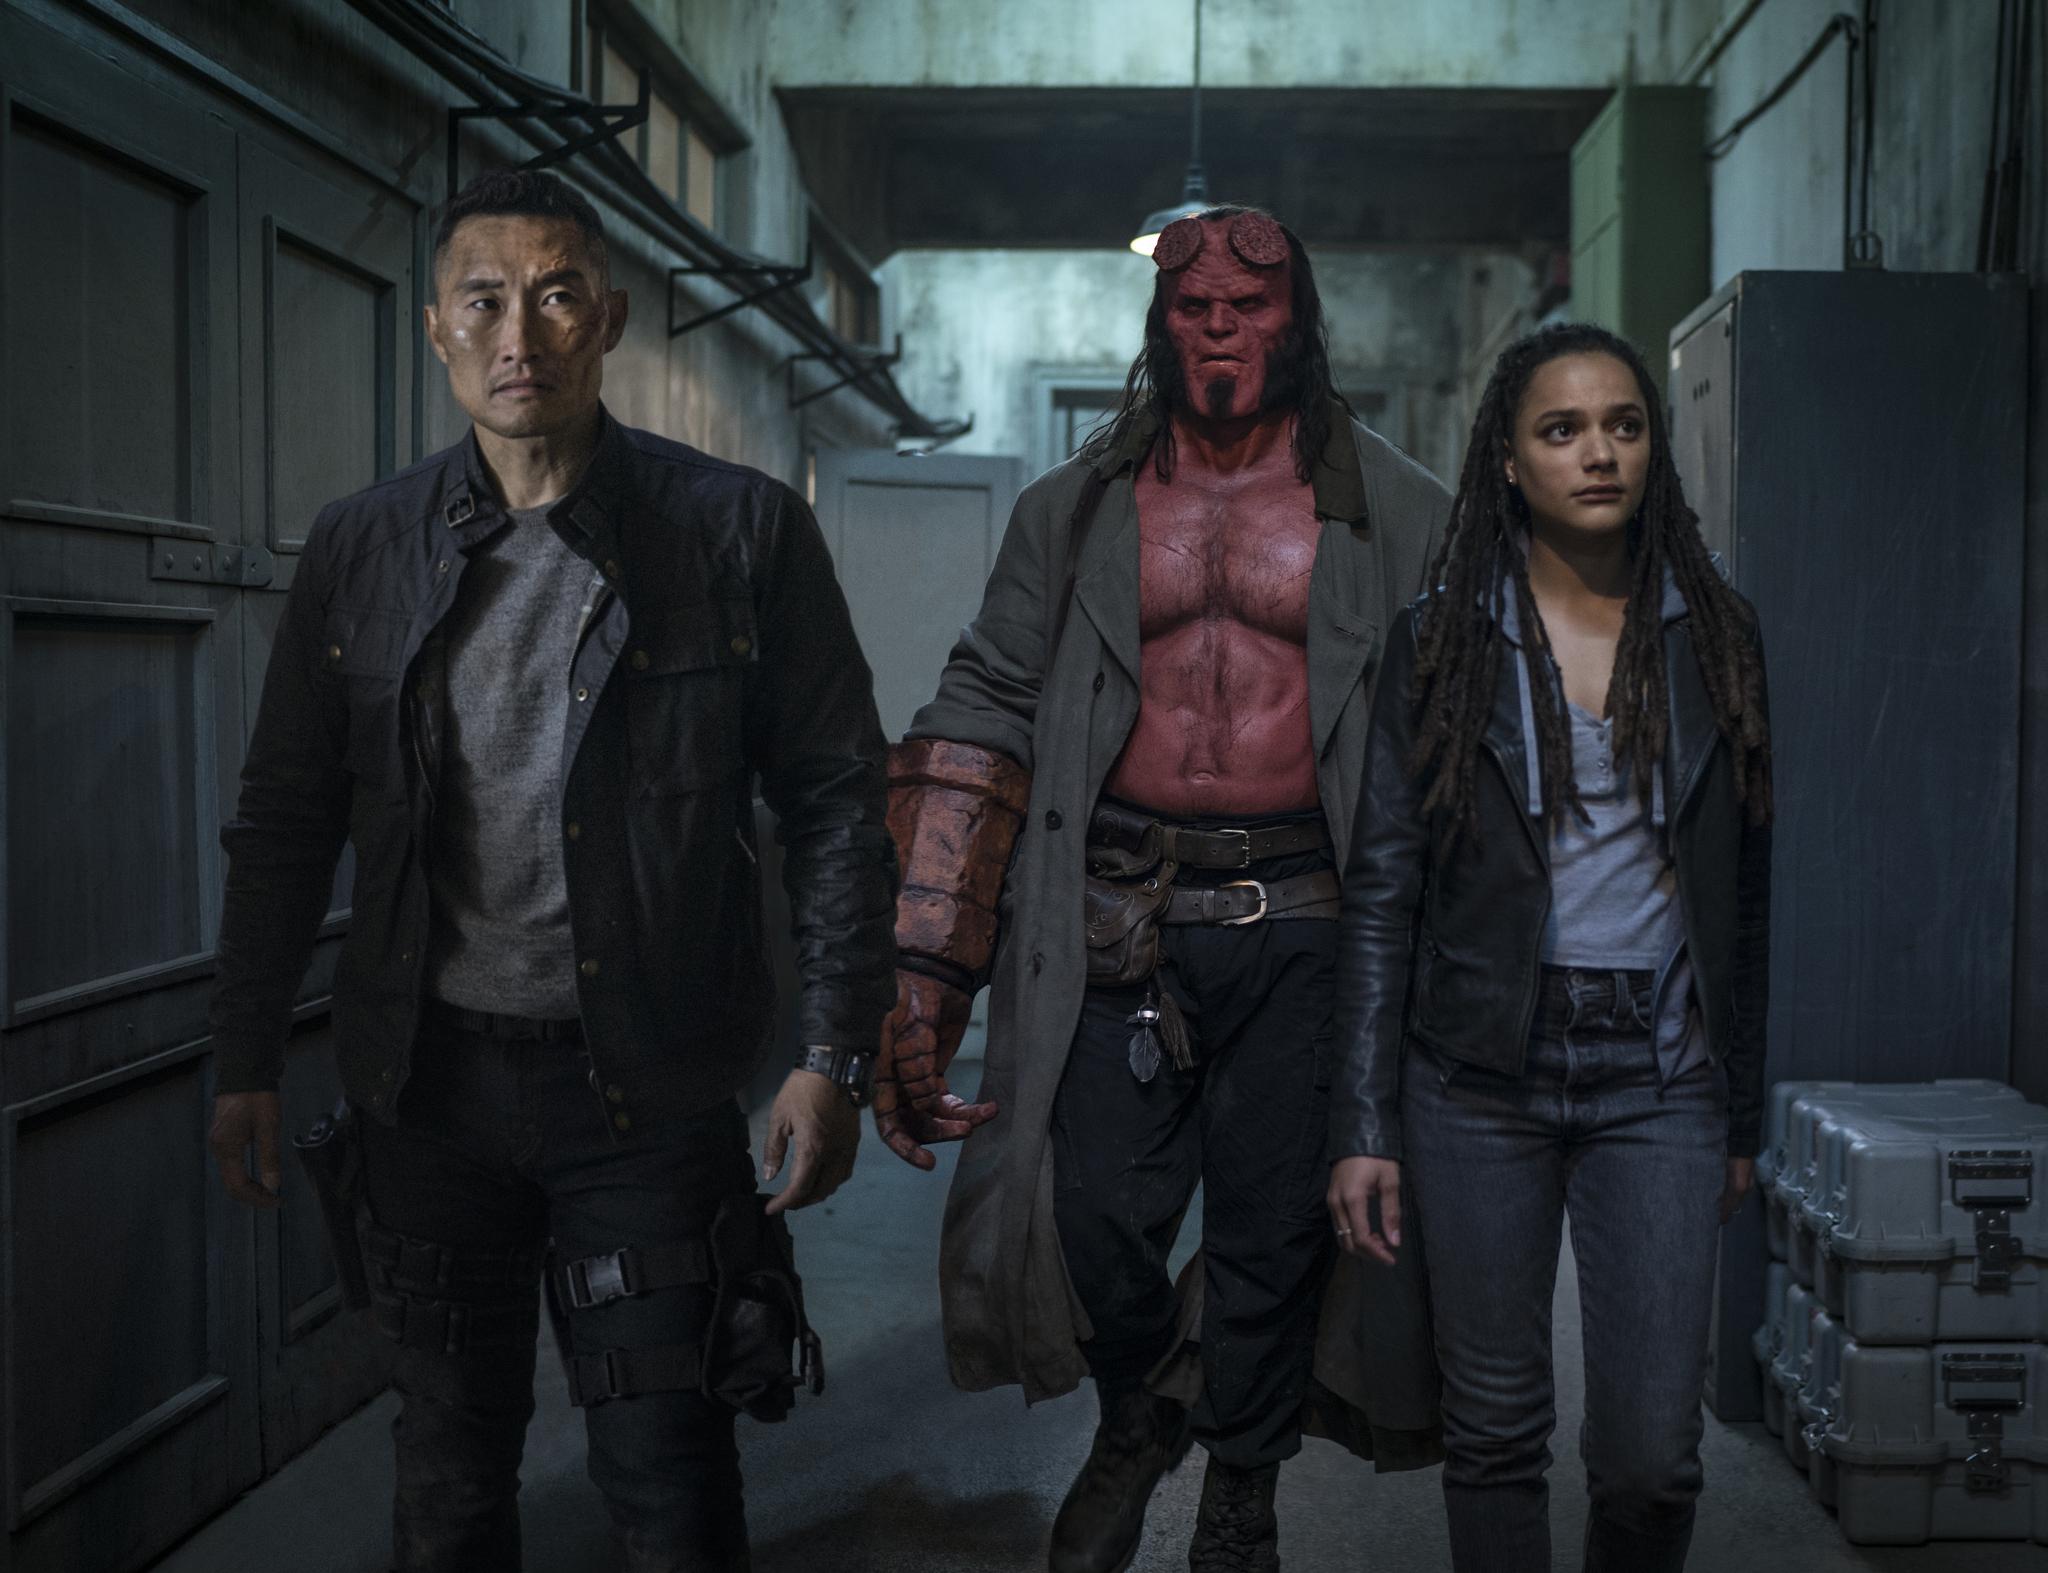 Daniel Dae Kim, David Harbour, and Sasha Lane in Hellboy (2019)